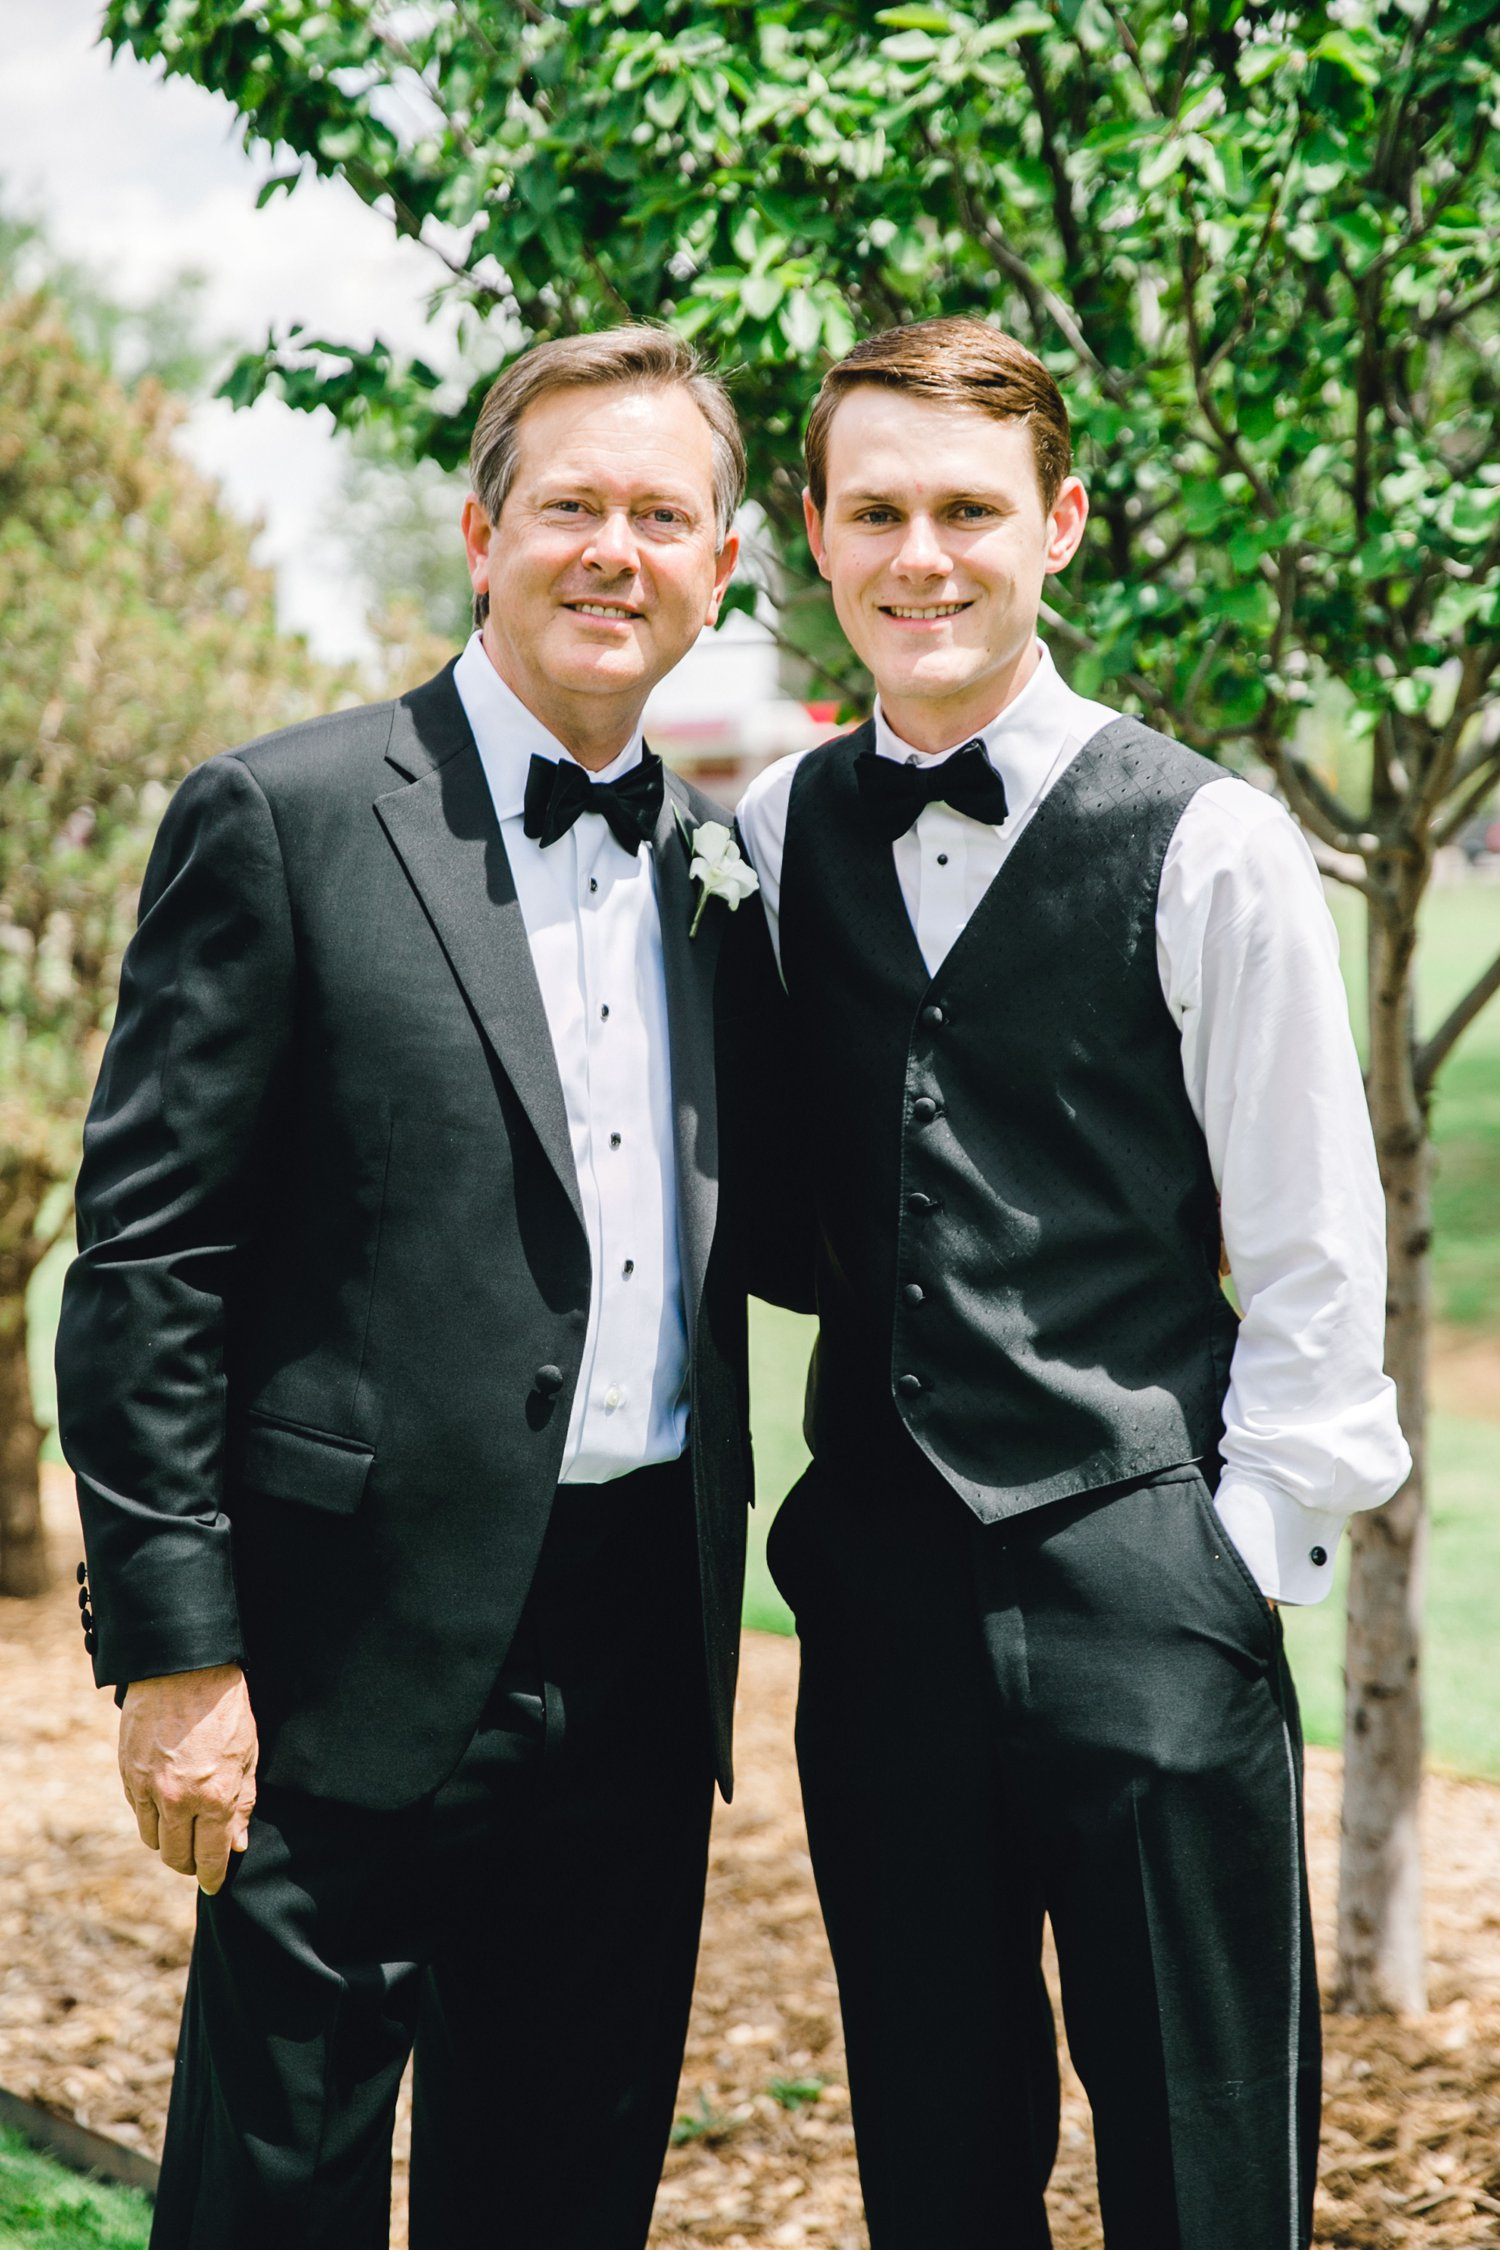 Taylor-and-Brock-Williams-Texas-Tech-University-Merket-Alumni-Center-Lubbock-Photographer-ALLEEJ0037.jpg